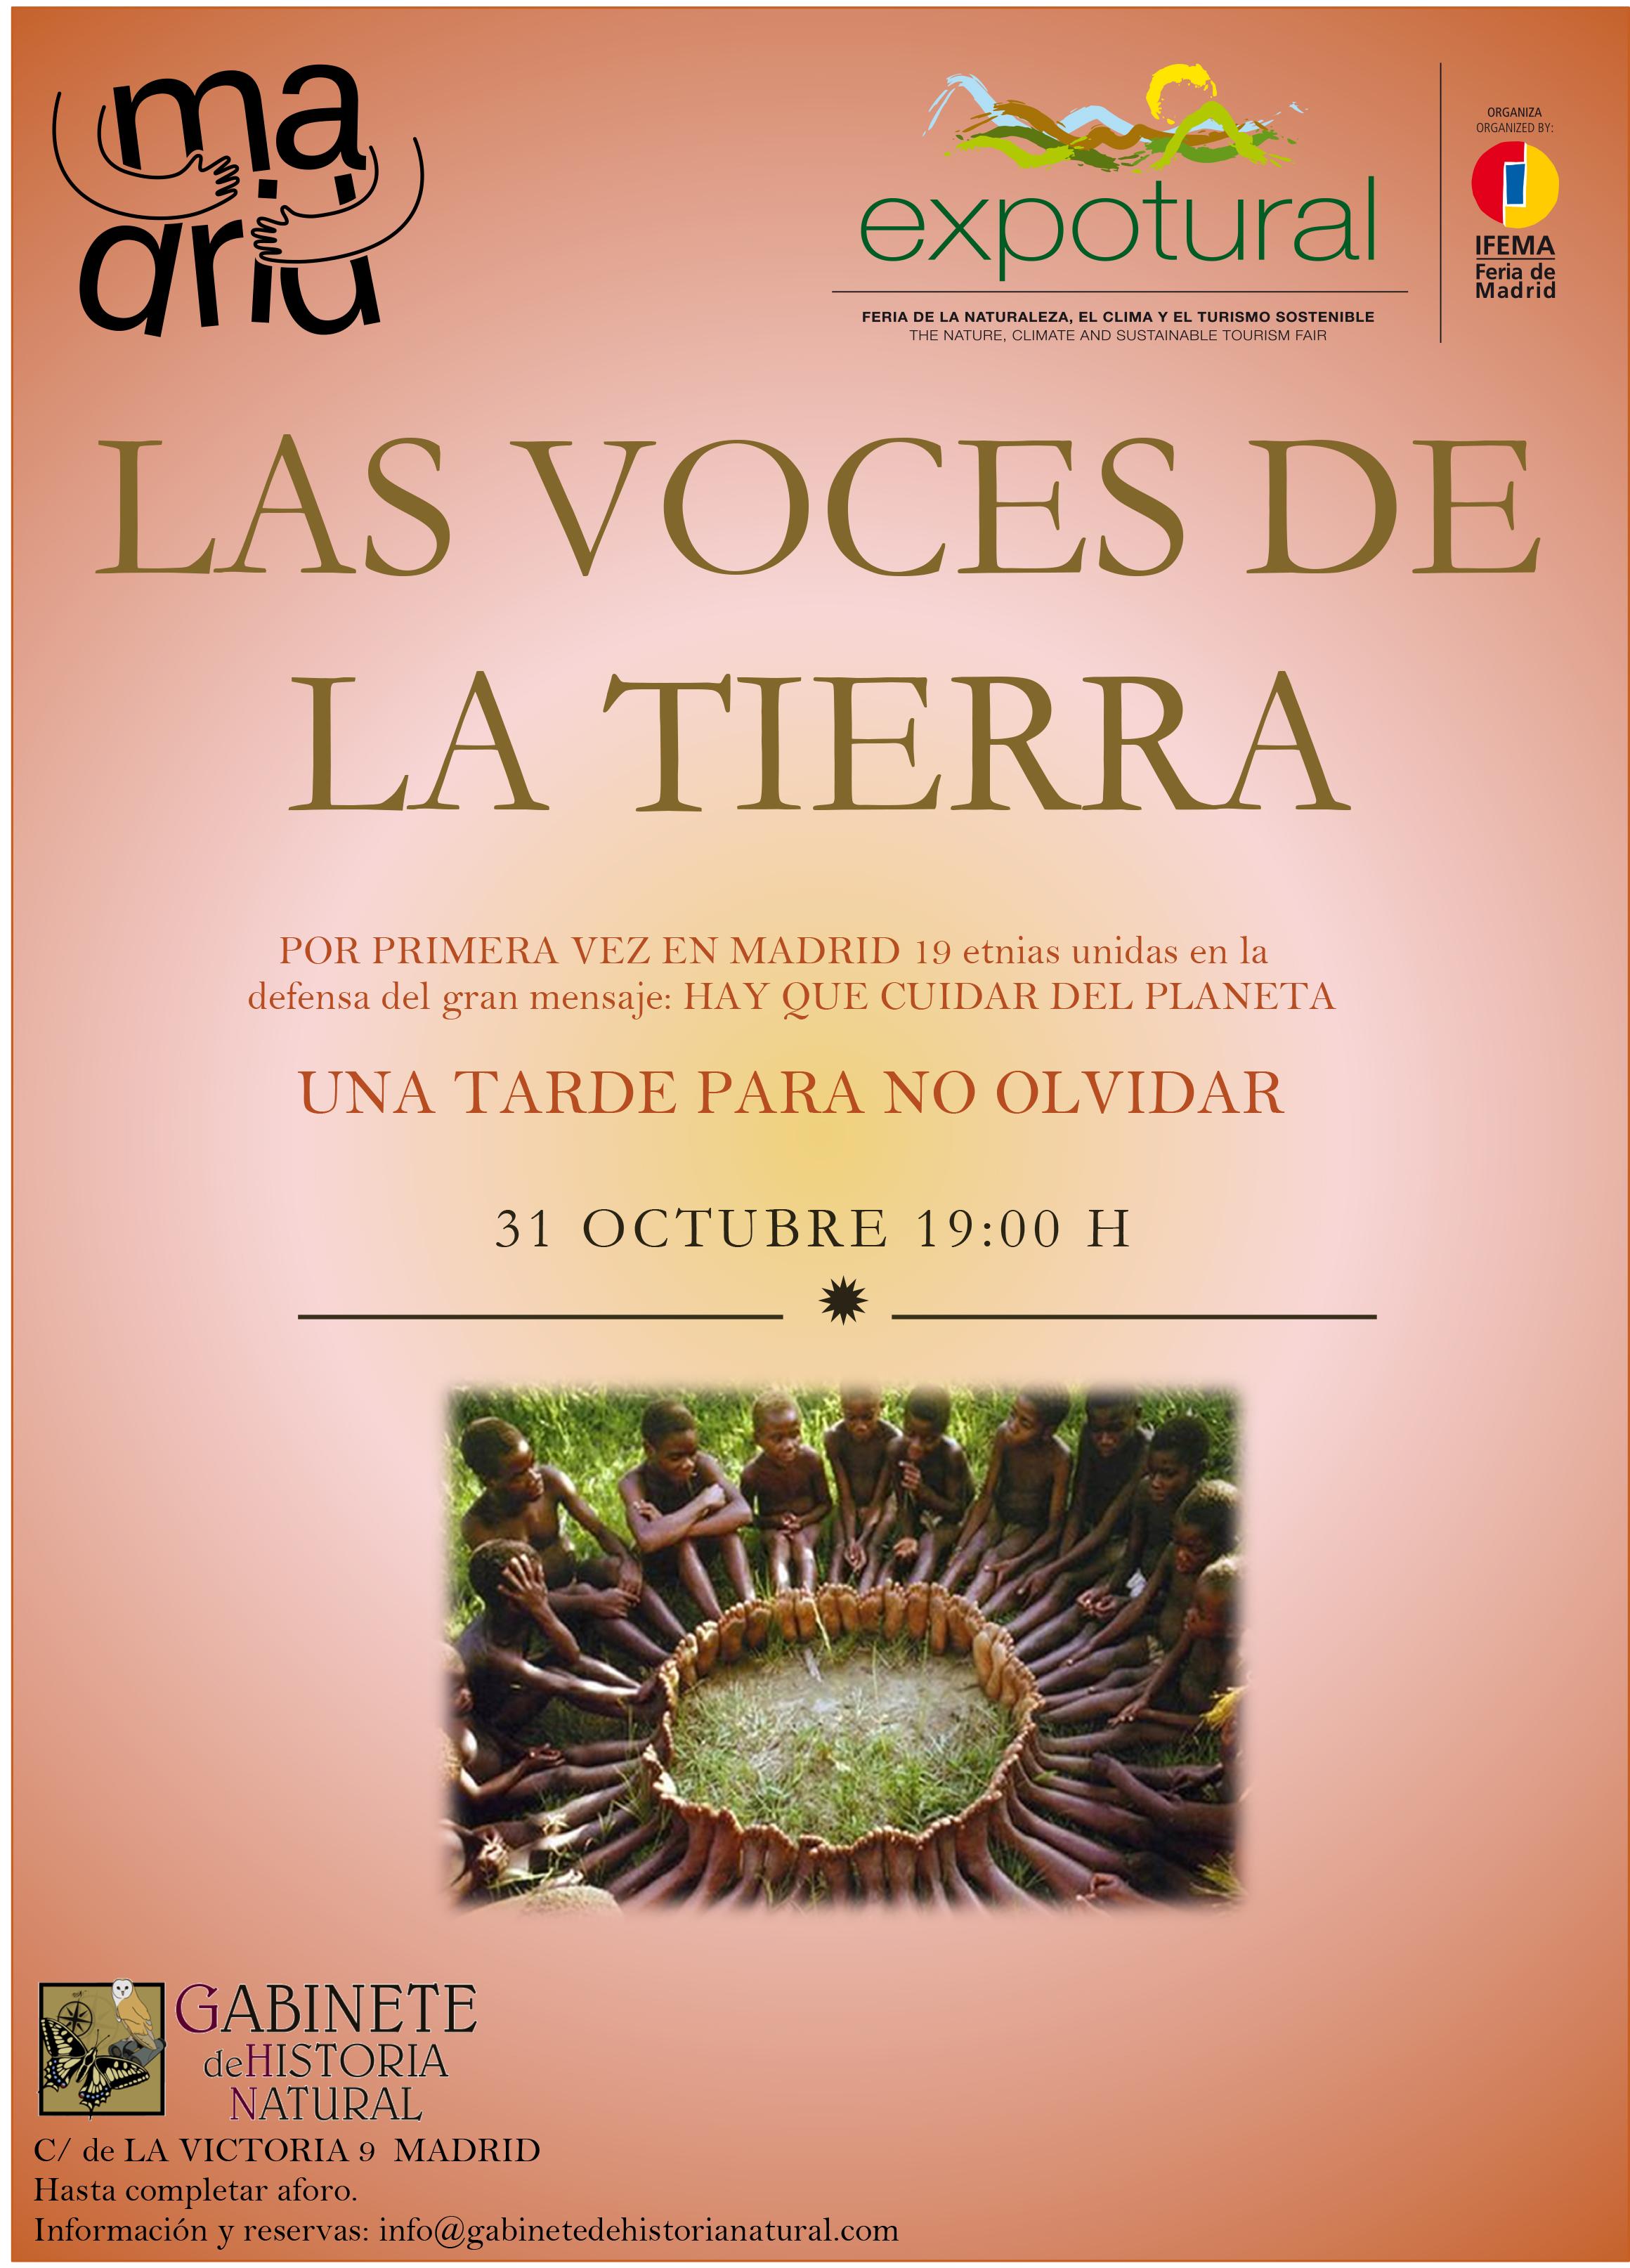 Microsoft Word - Cartel VOCES DE LA TIERRA ok.docx